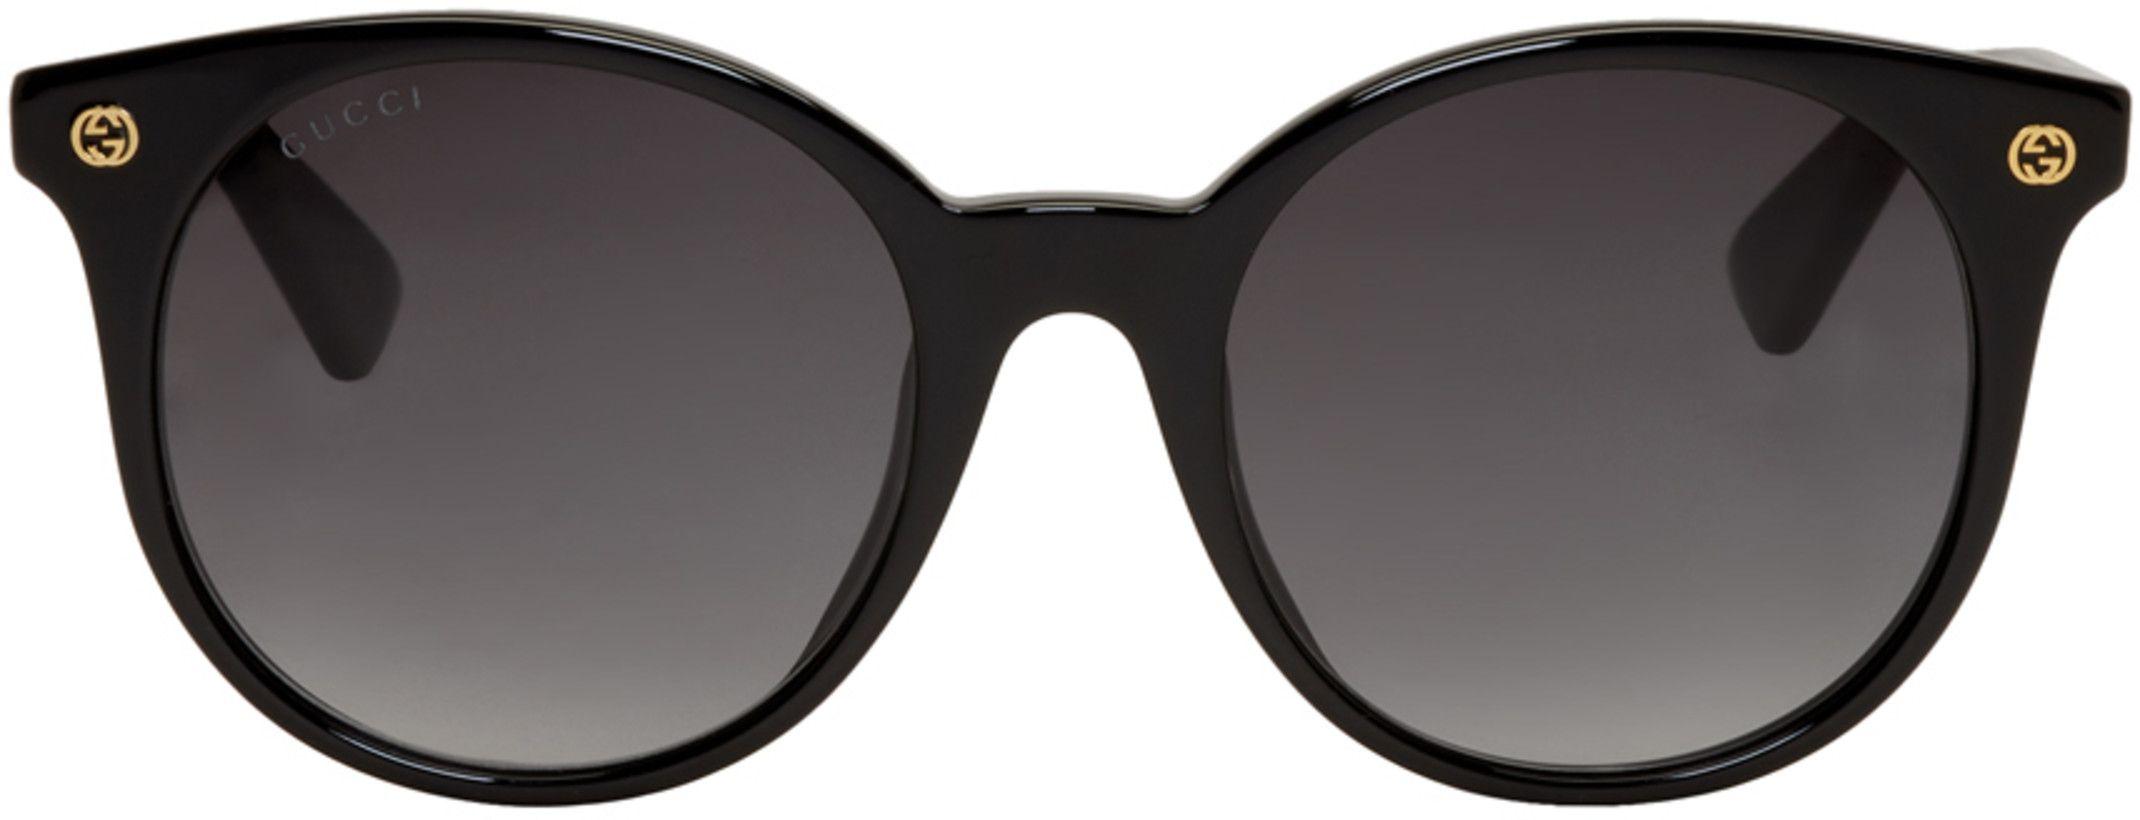 990b408c0dc Gucci Black Pantos Sunglasses